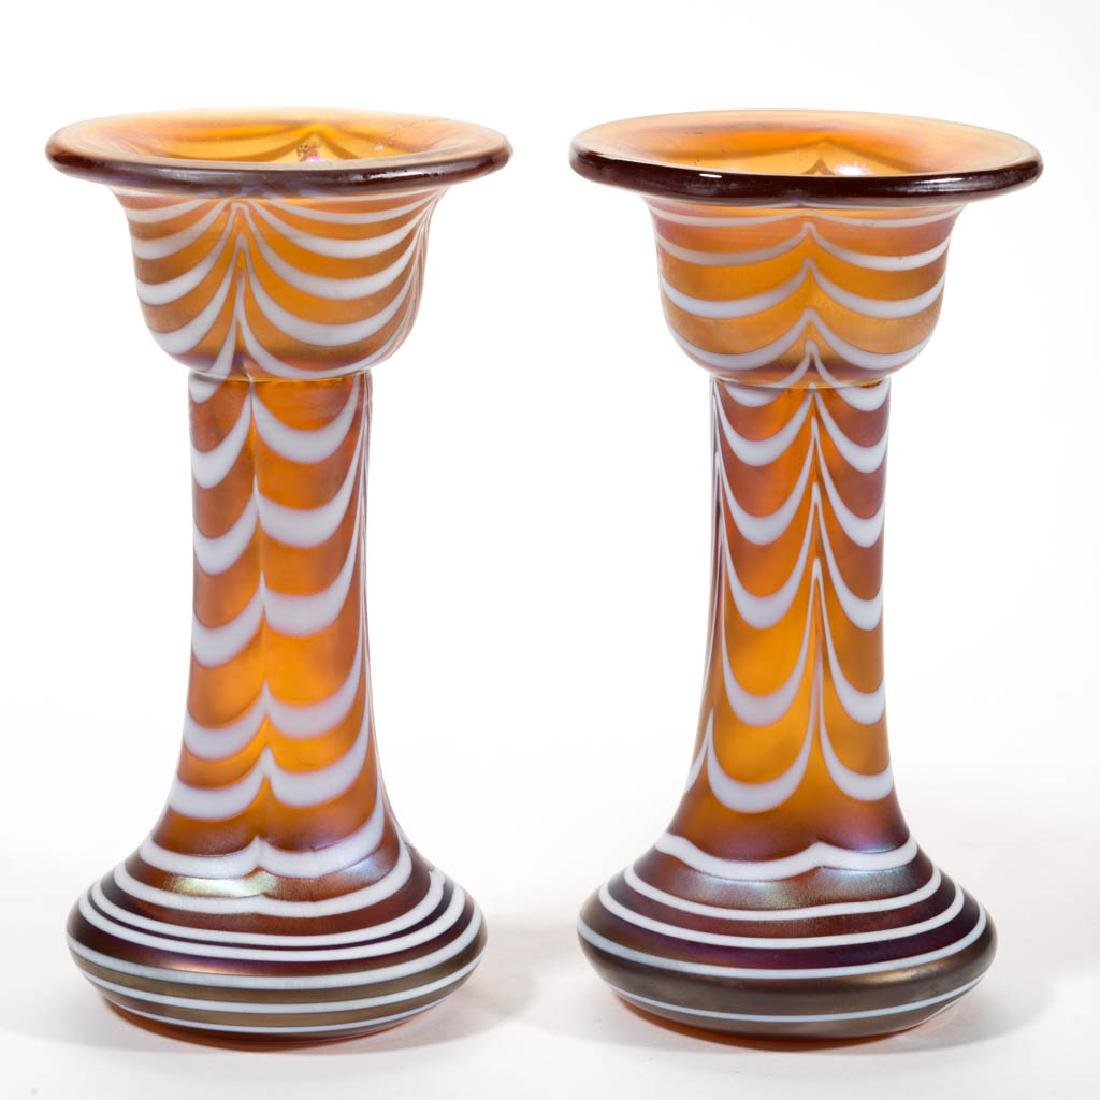 IRIDESCENT LOOP STUDIO ART GLASS PAIR OF VASES